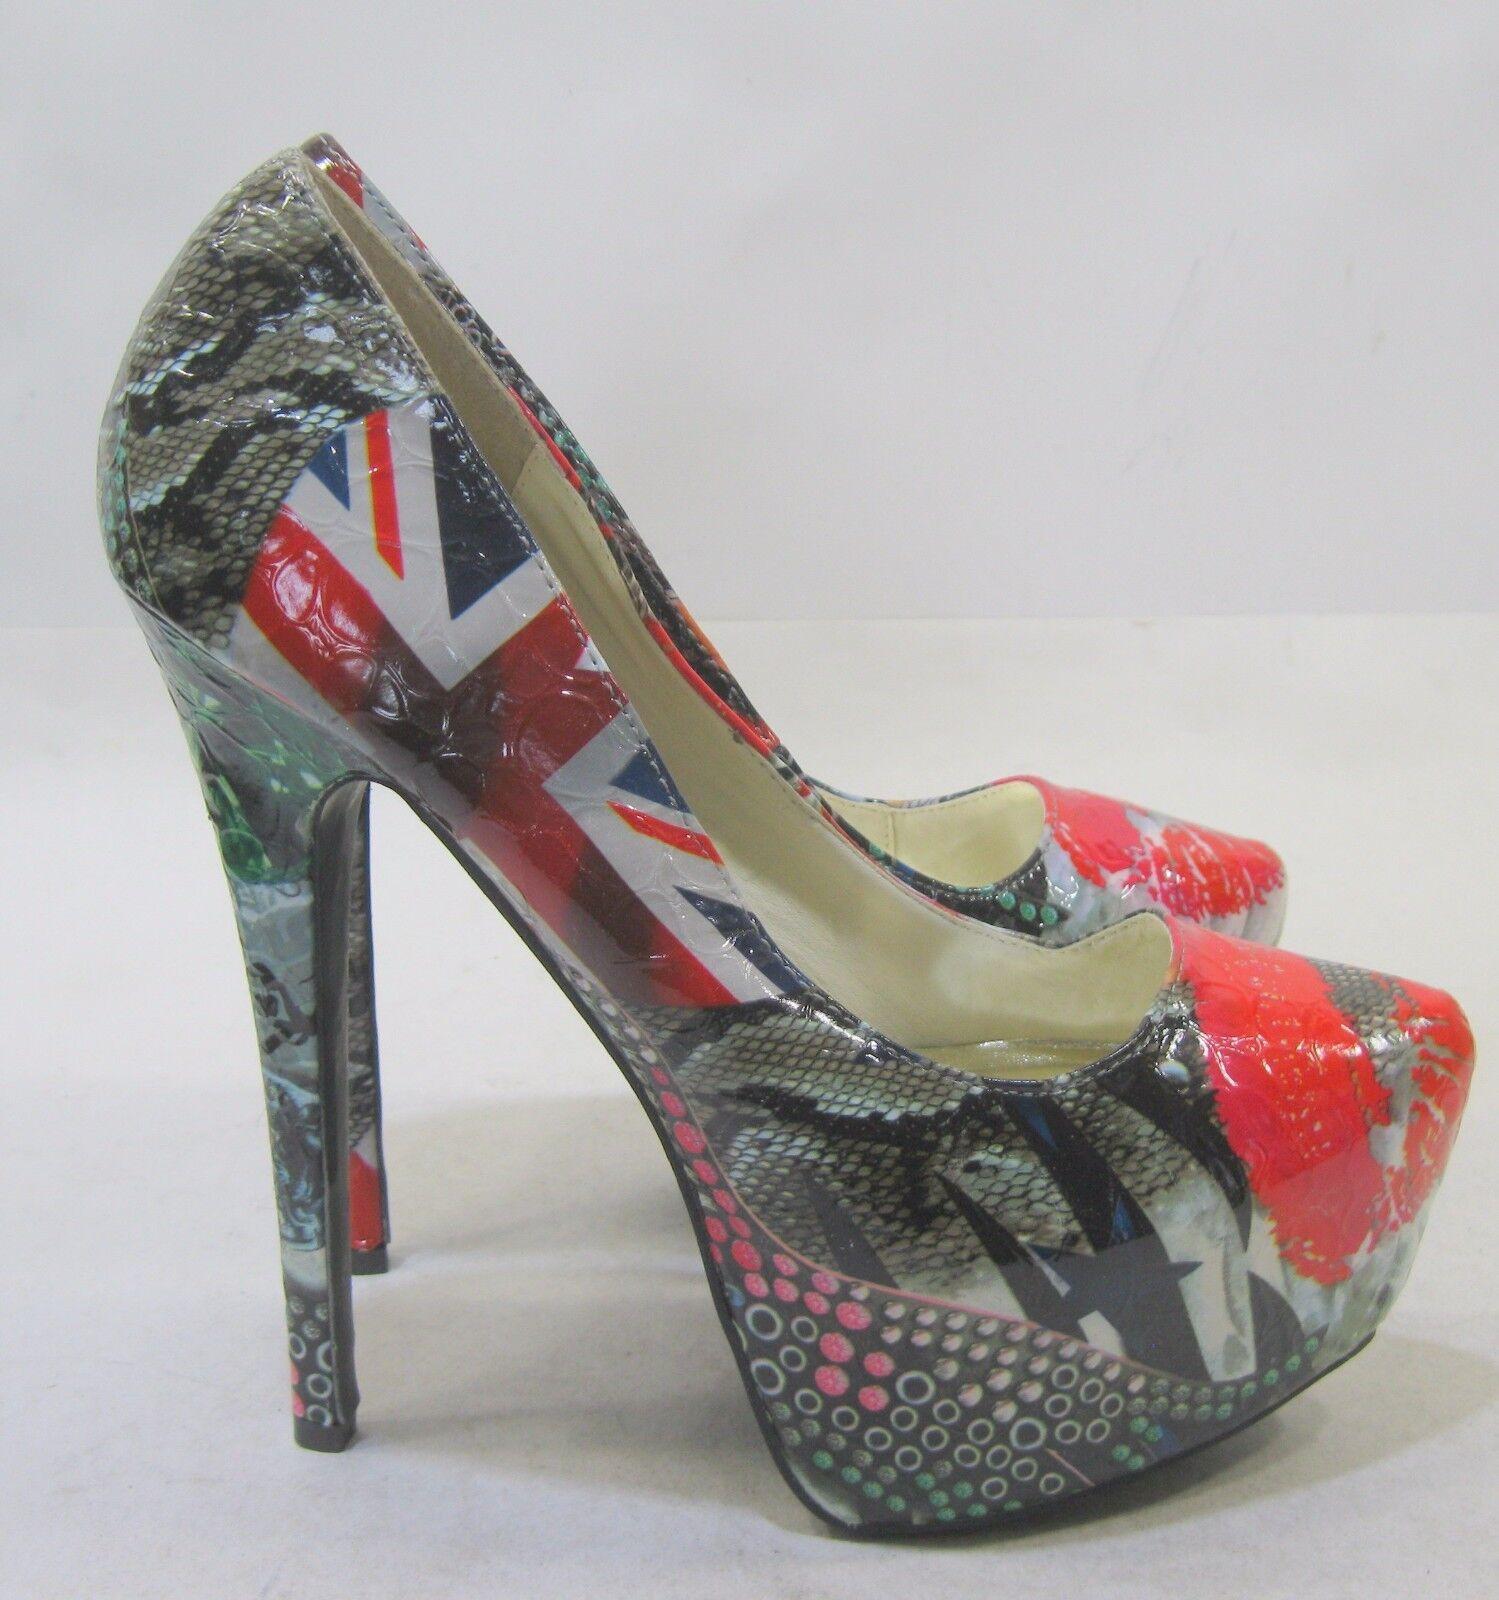 NEW Bumper British Kiss 6.5  High Stiletto Heel 2  Platform Sexy shoes Size 7.5